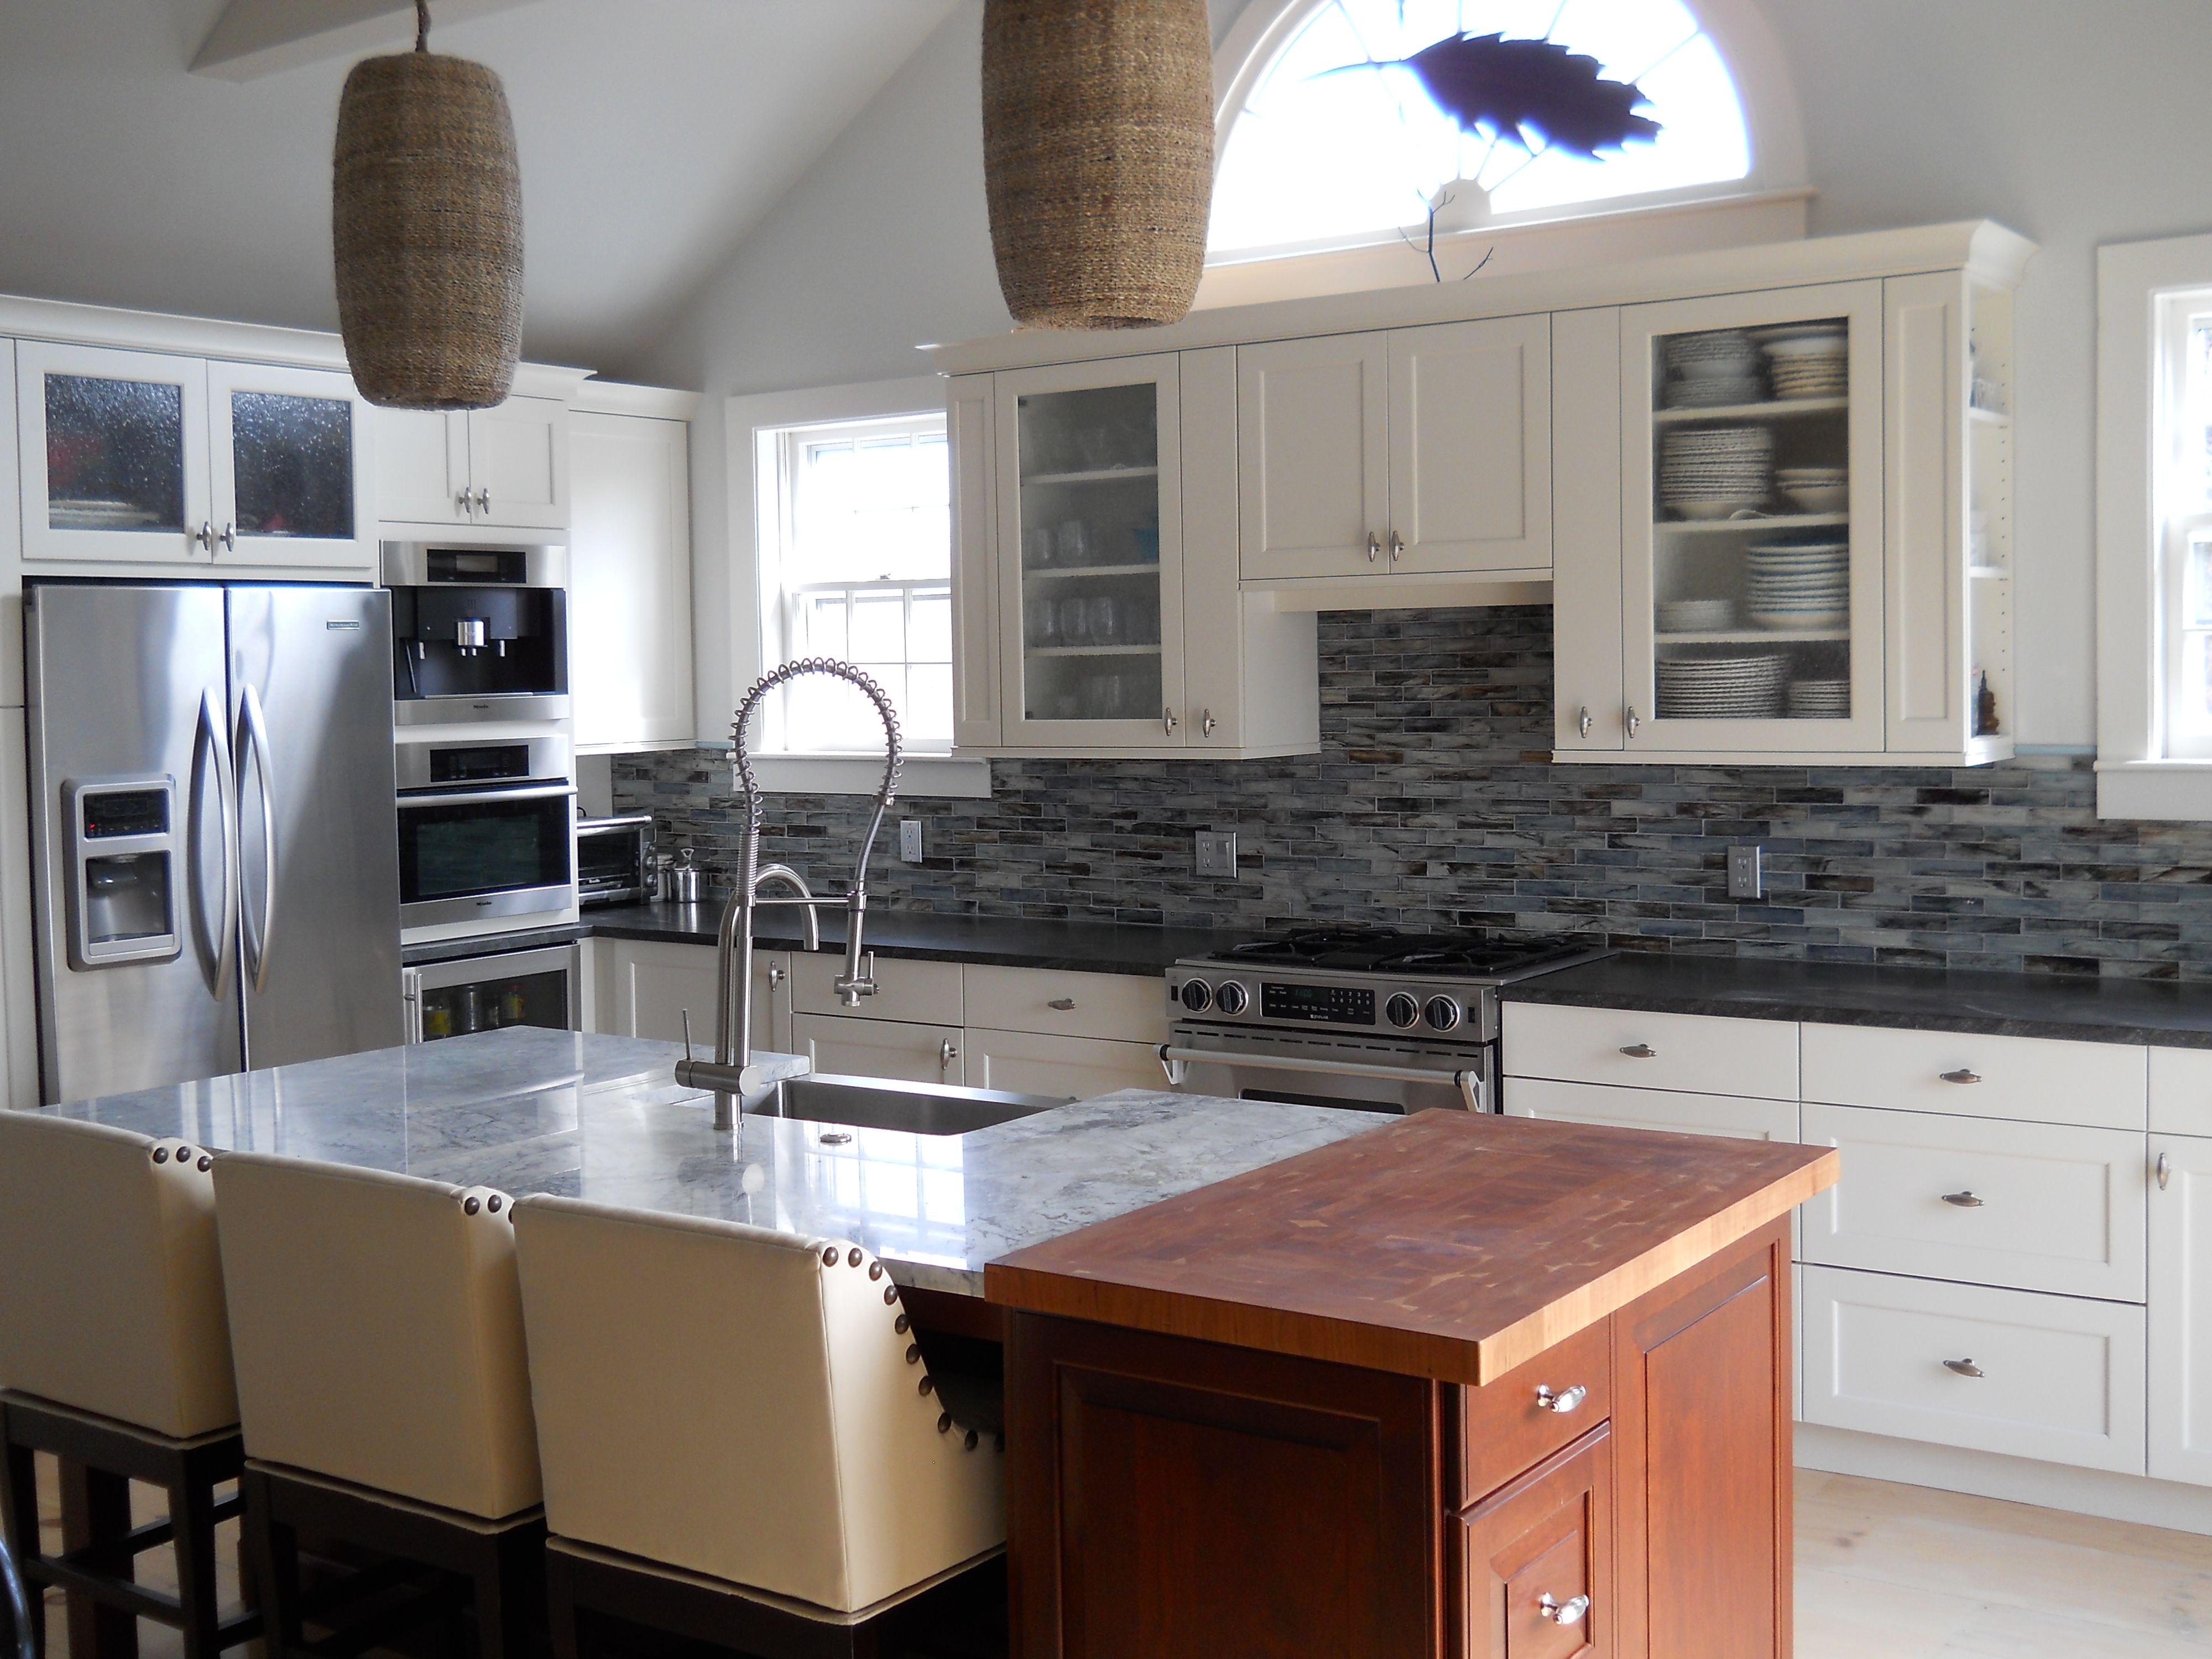 Nantucket Kitchen By Rebecca Tolliver Wood Floor Design Painted Kitchen Cabinets Colors Modern Kitchen Design